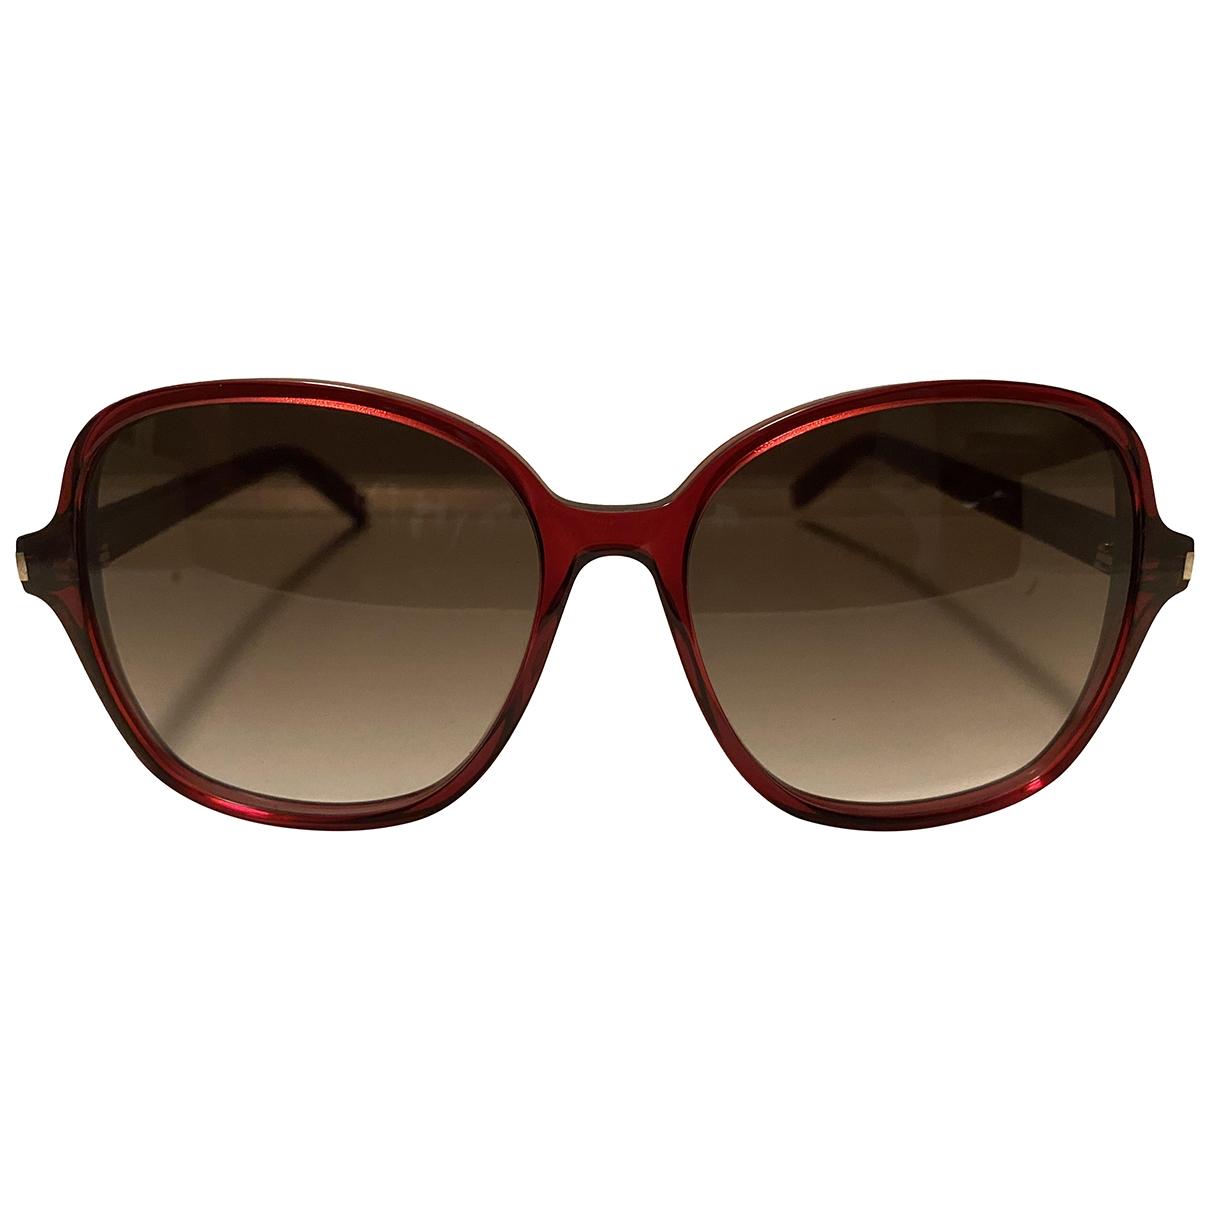 Saint Laurent \N Burgundy Sunglasses for Women \N